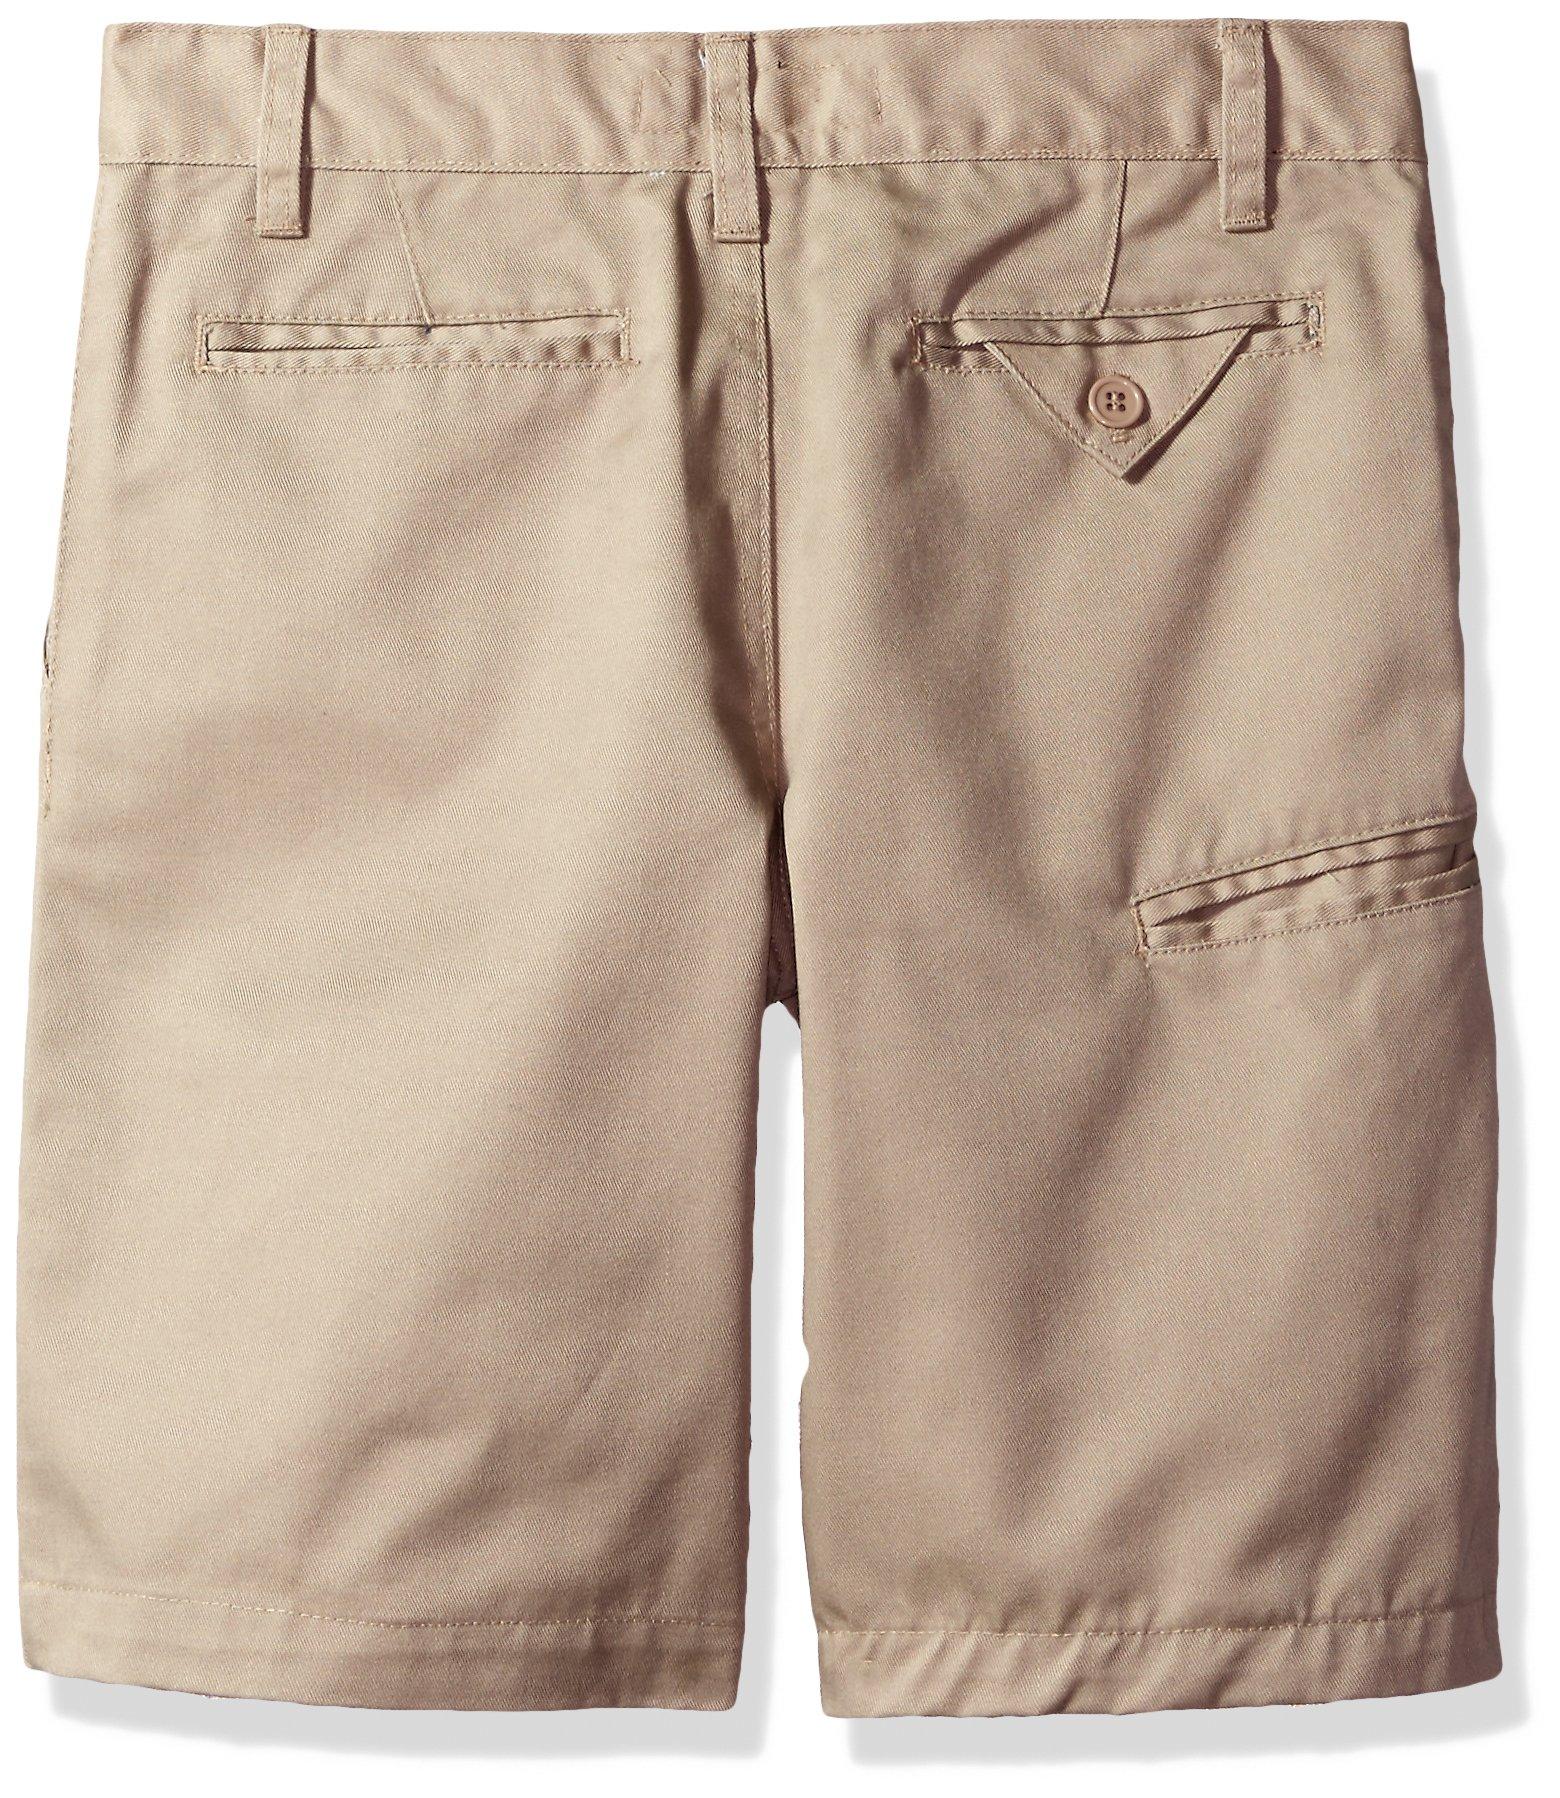 U.S. Polo Assn. Big Boys' Twill Short (More Styles Available), Khaki-IIIBEB, 20 by U.S. Polo Assn. (Image #2)